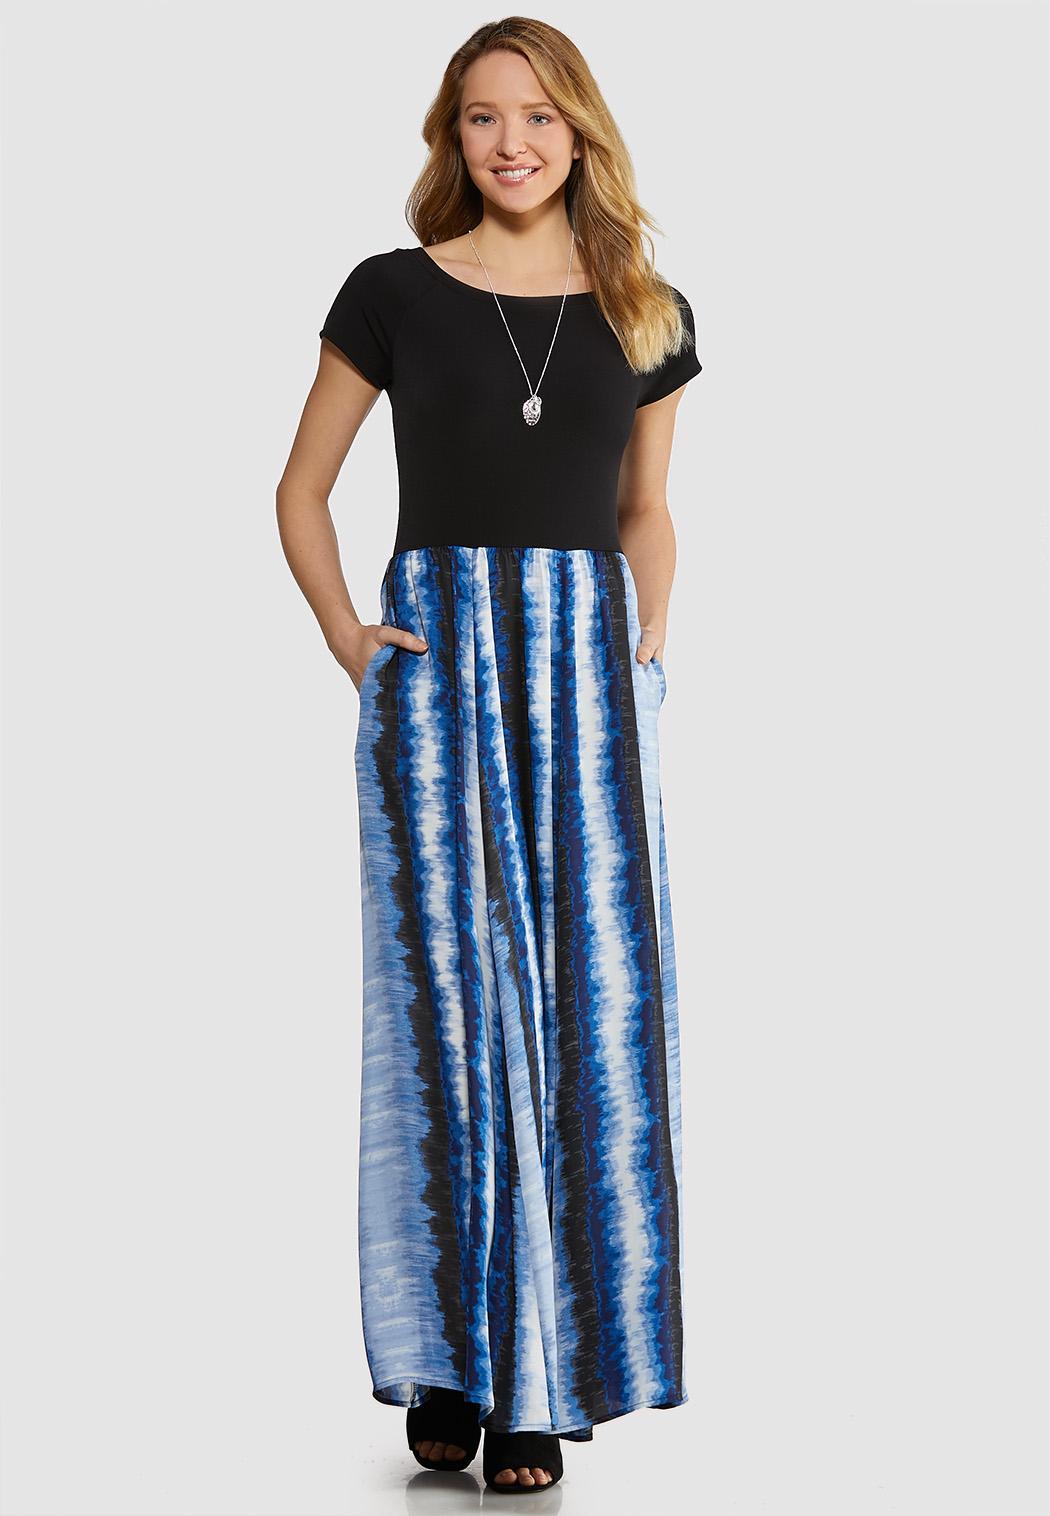 Plus Size Solid Tie Dye Maxi Dress